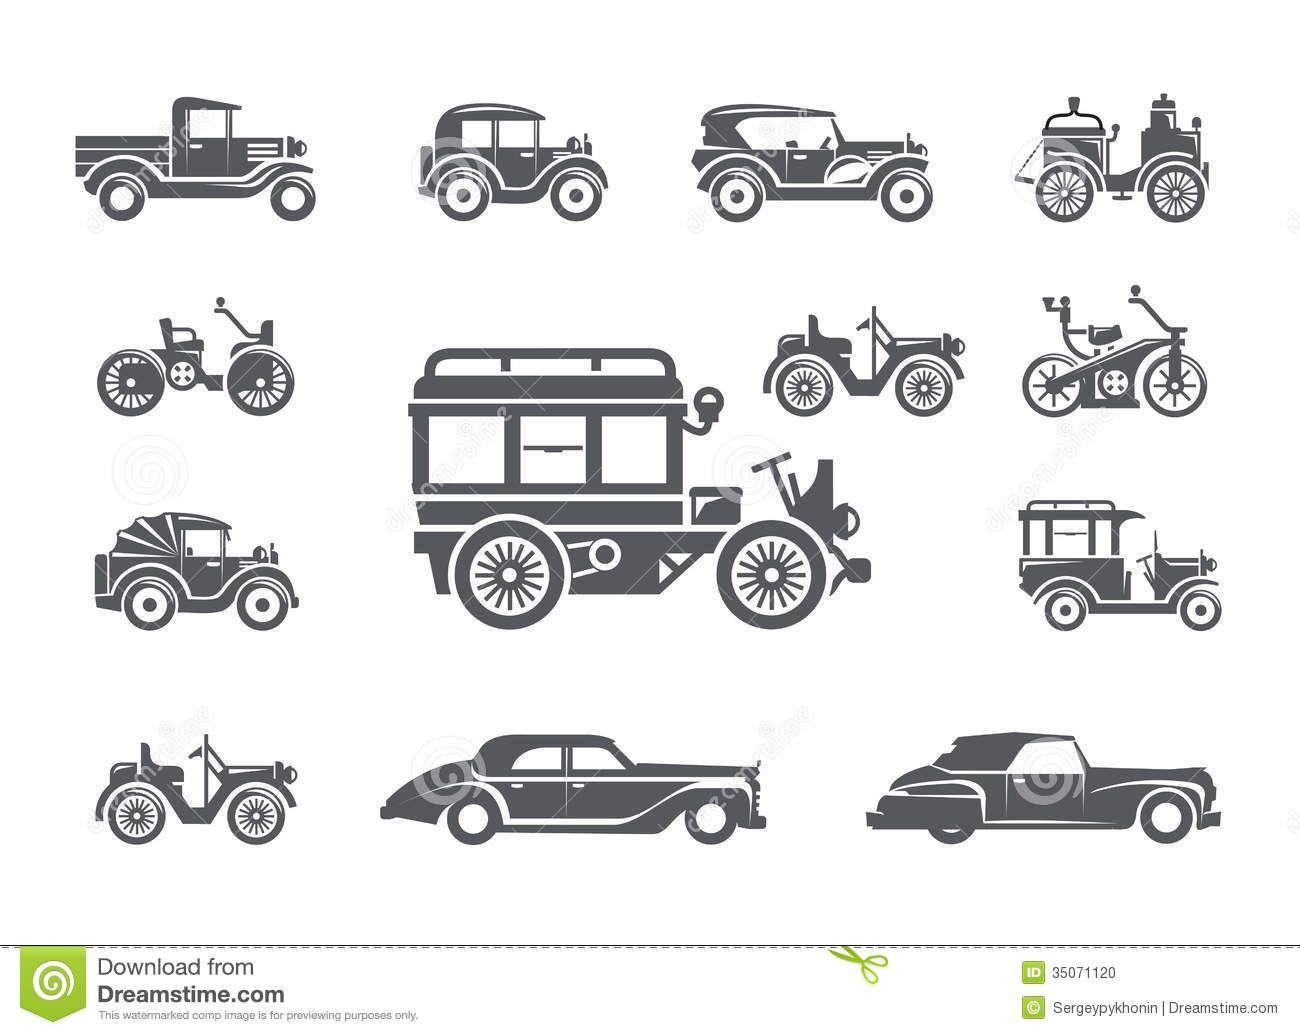 vintage car illustrations - Google Search   Illustration ...